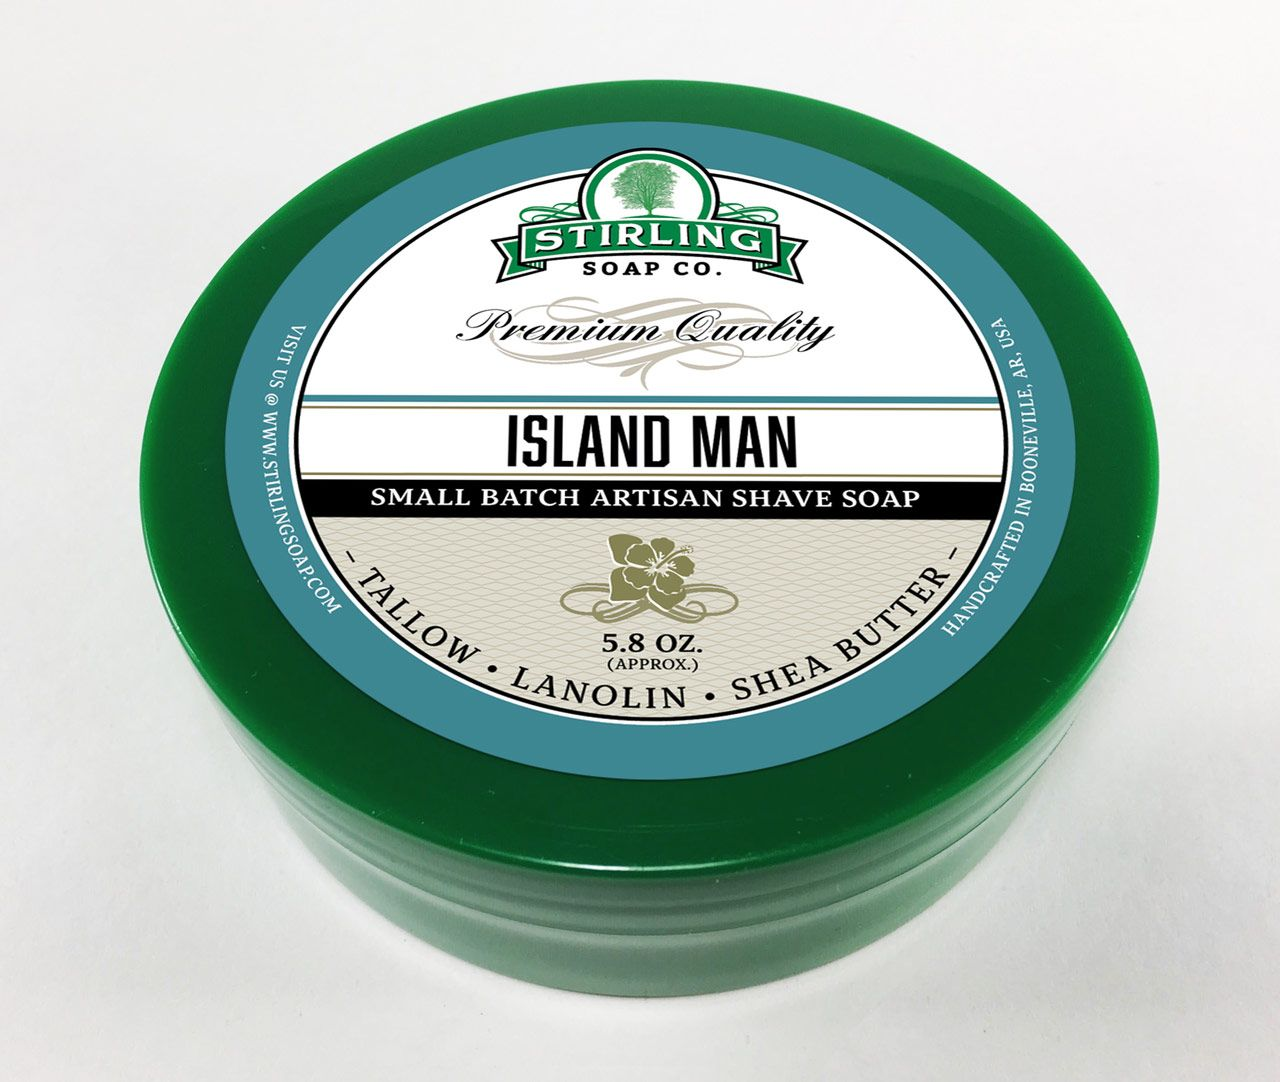 Mydło do golenia Stirling Island Man Shaving Soa